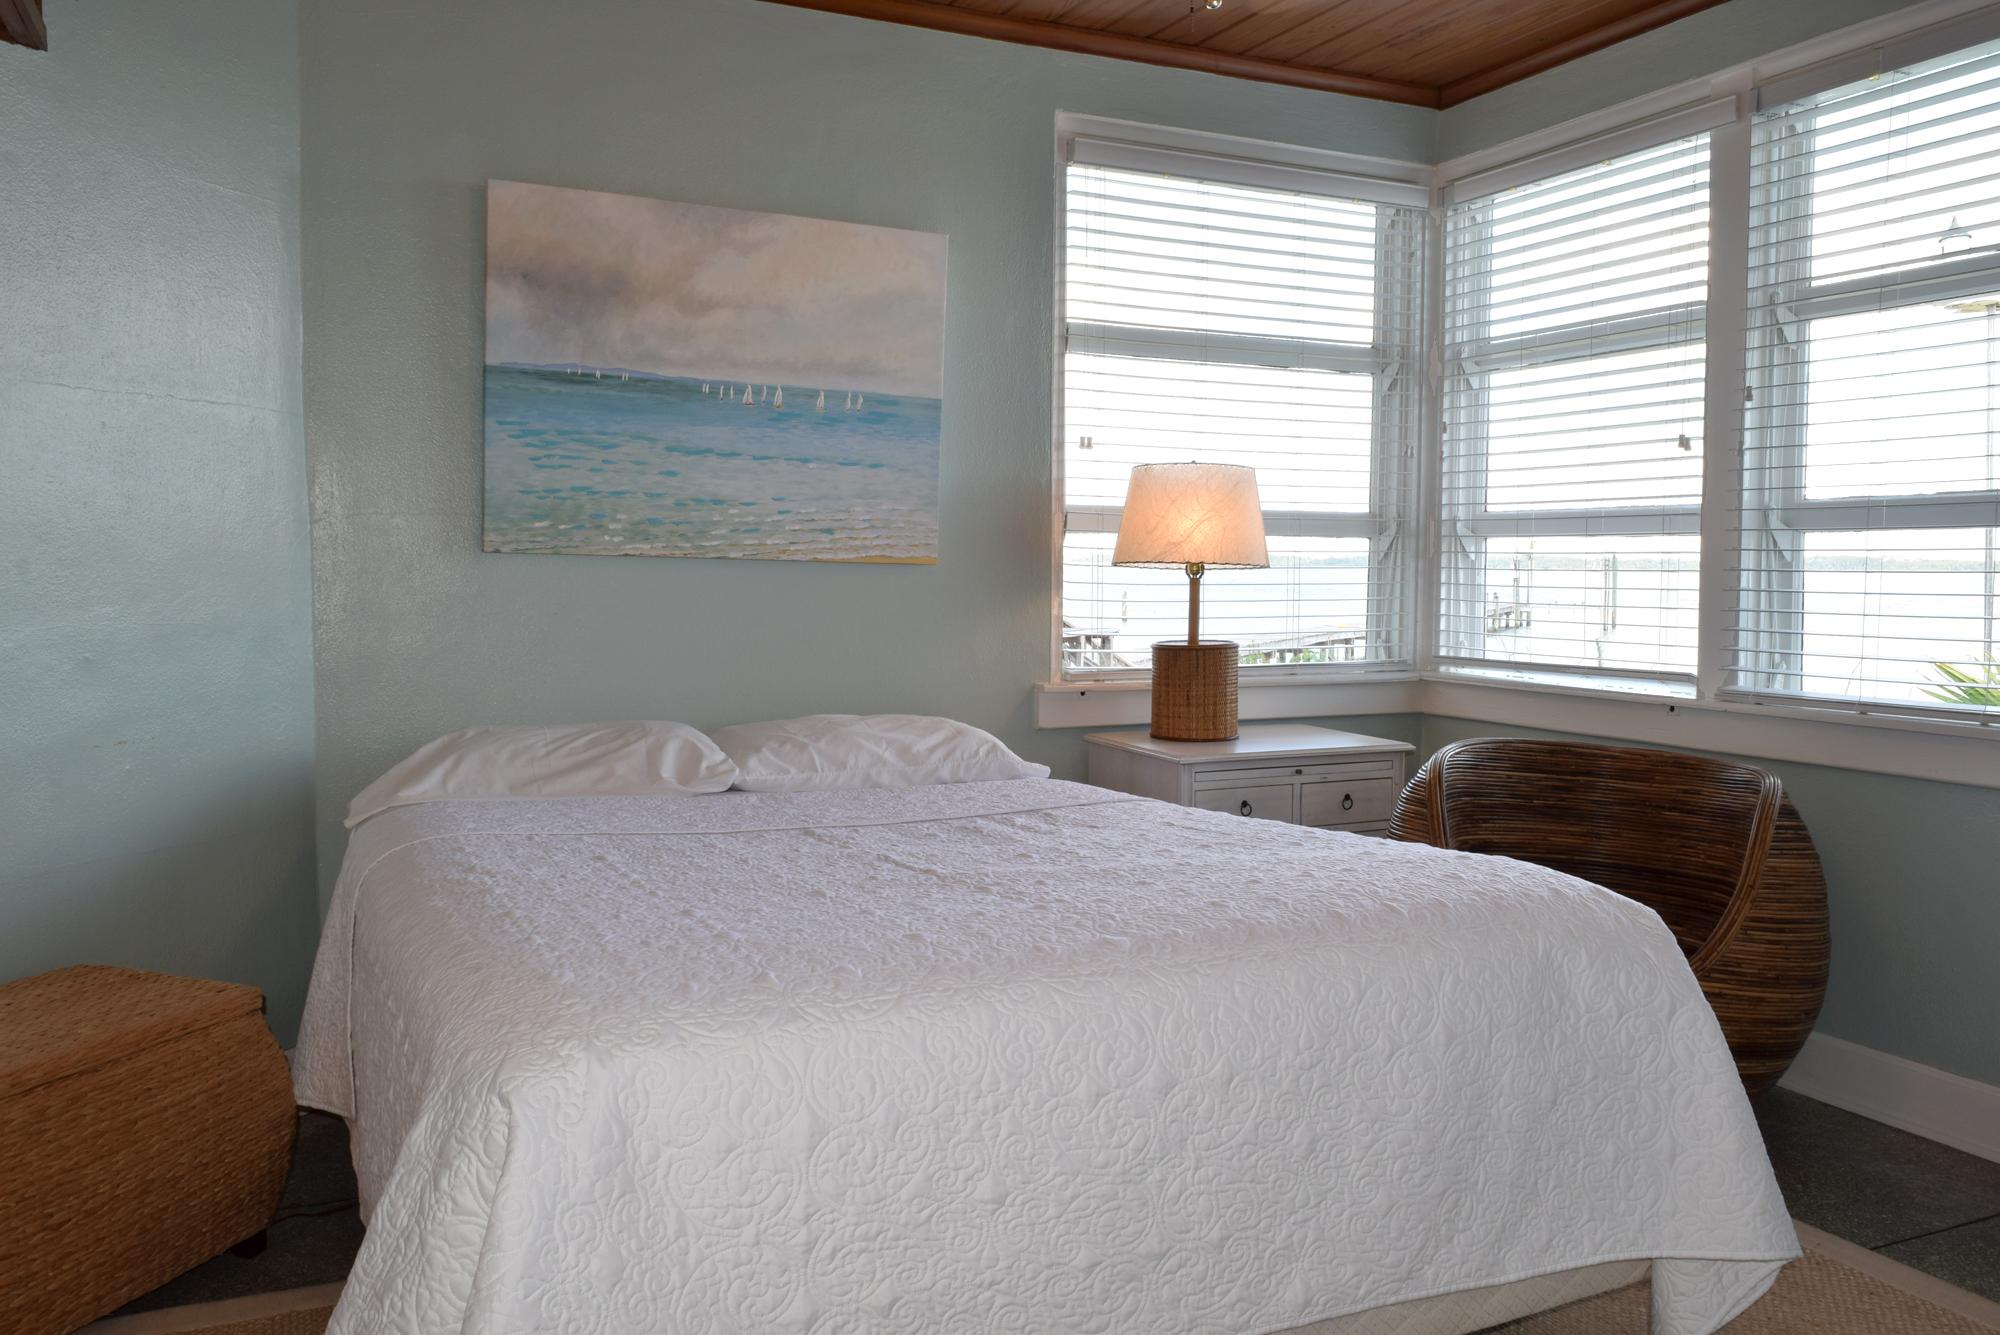 Panferio 603 House/Cottage rental in Pensacola Beach House Rentals in Pensacola Beach Florida - #12